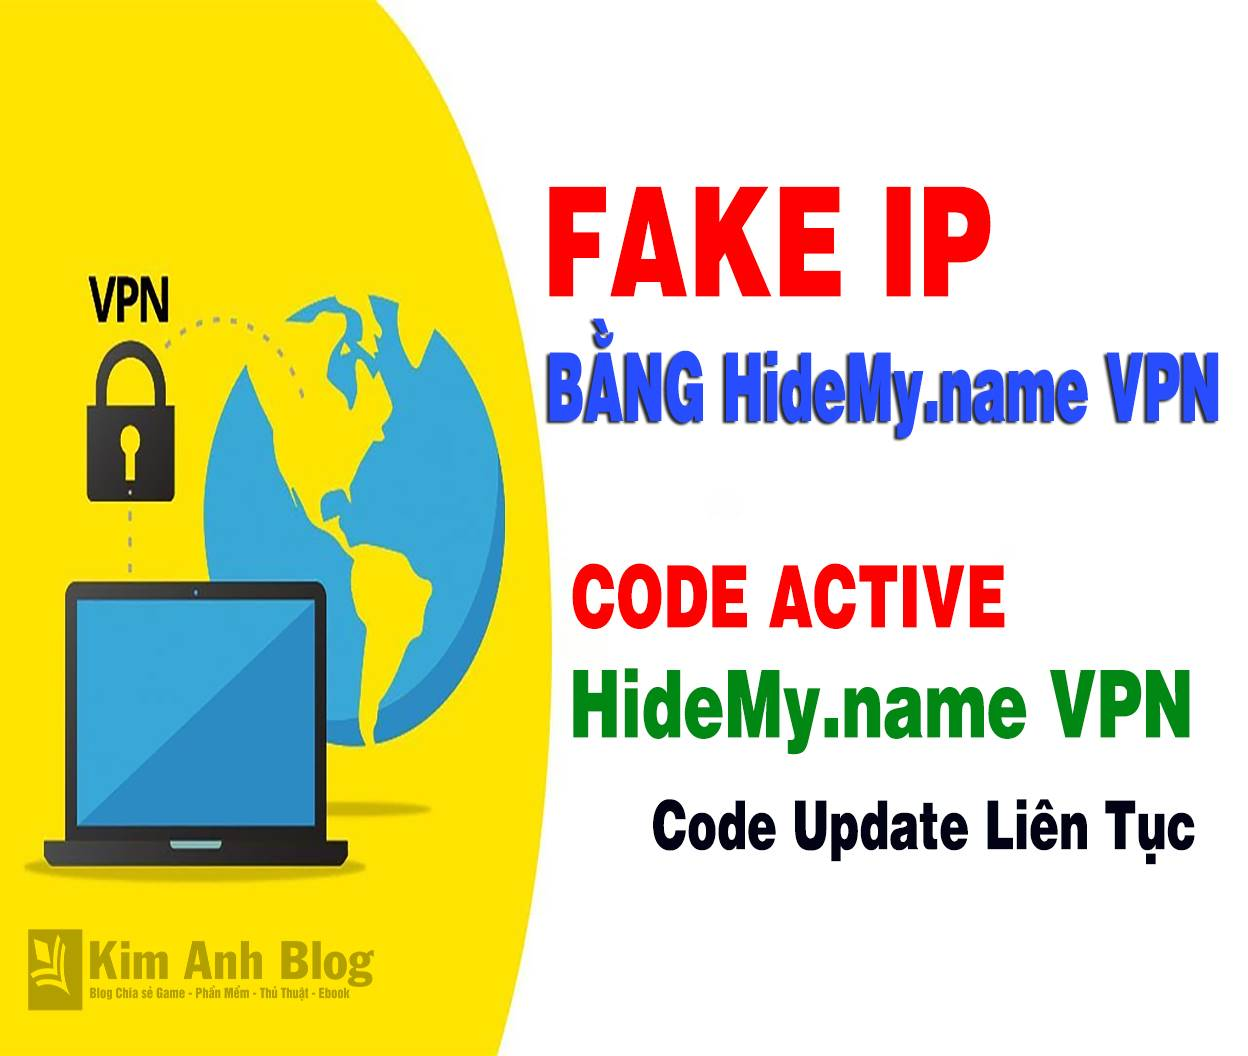 code hidemy name, code hidemy.name vpn, hide my name proxy, hidemy.name vpn 1.43, hidemy.name vpn code, hidemy.name vpn crack, hidemy.name vpn download, hidemy.name vpn full, hidemy.name vpn key, luot web an danh, phan mem fake ip, vpn connection windows 10, vpn connection, phần mềm fake ip tốt nhất, fake ip cho pc